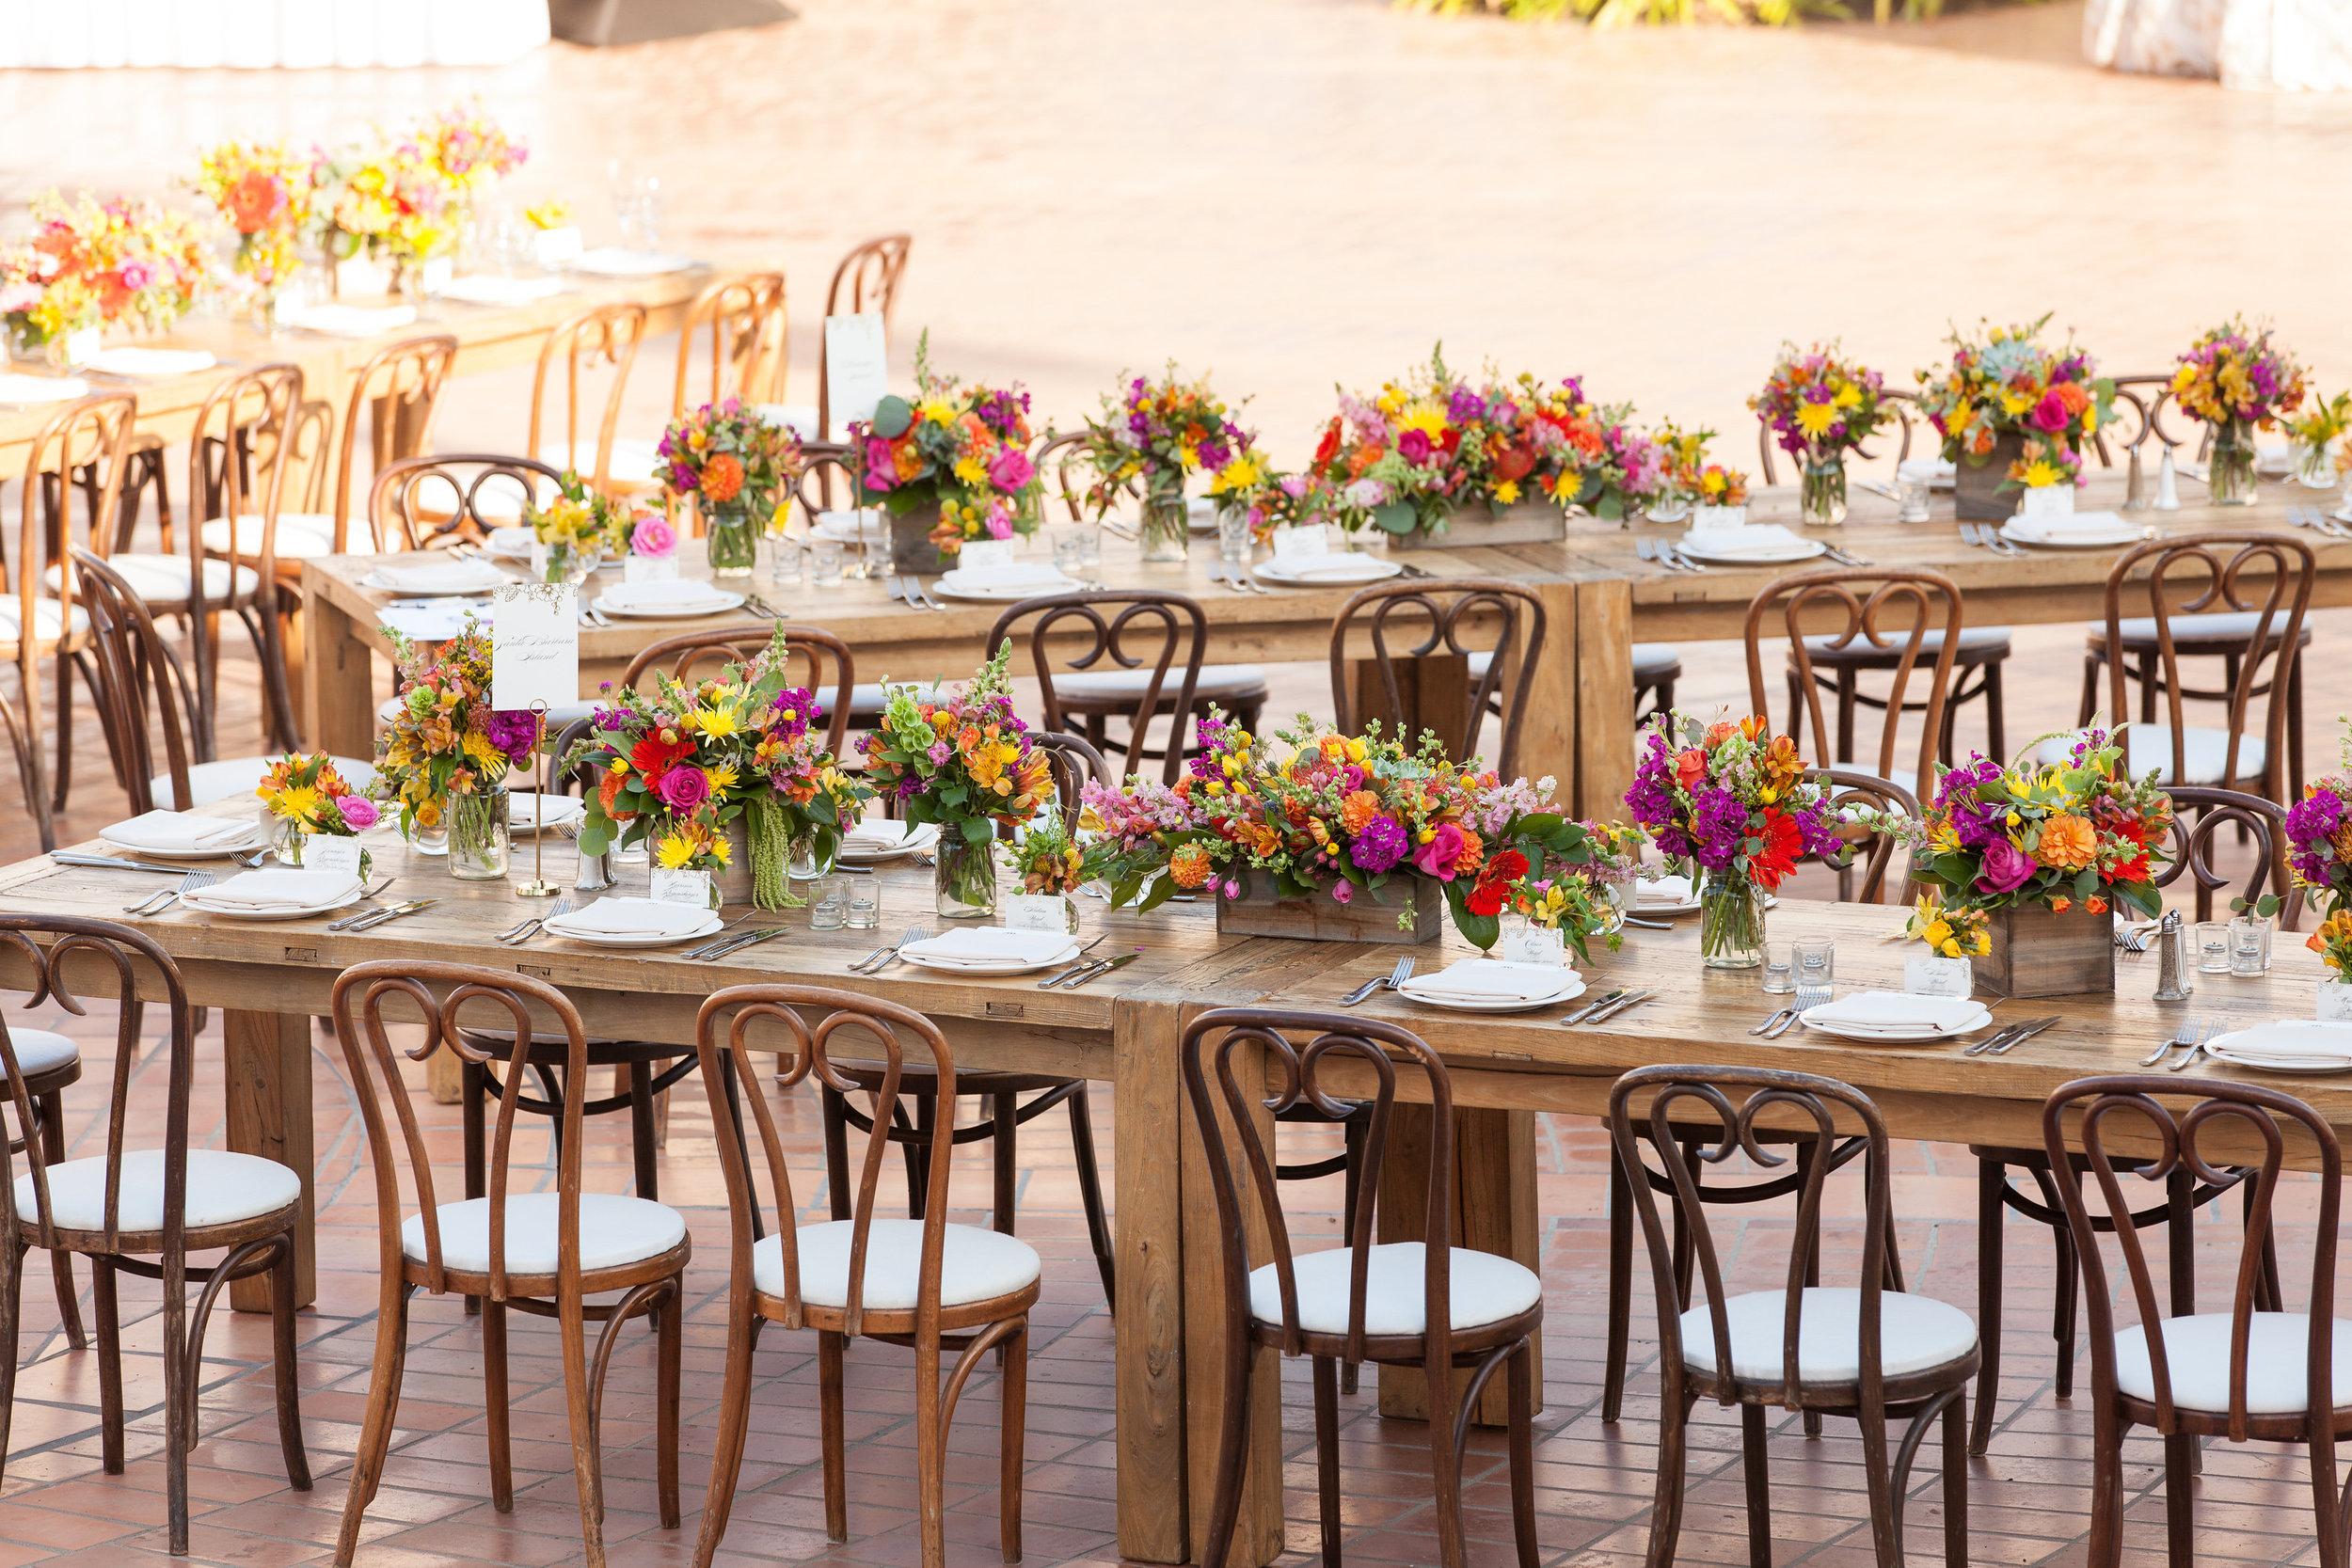 www.santabarbarawedding.com | fess parker resort | wedding ceremony | colorful centerpieces | Plaza del Sol | Bijoux Events